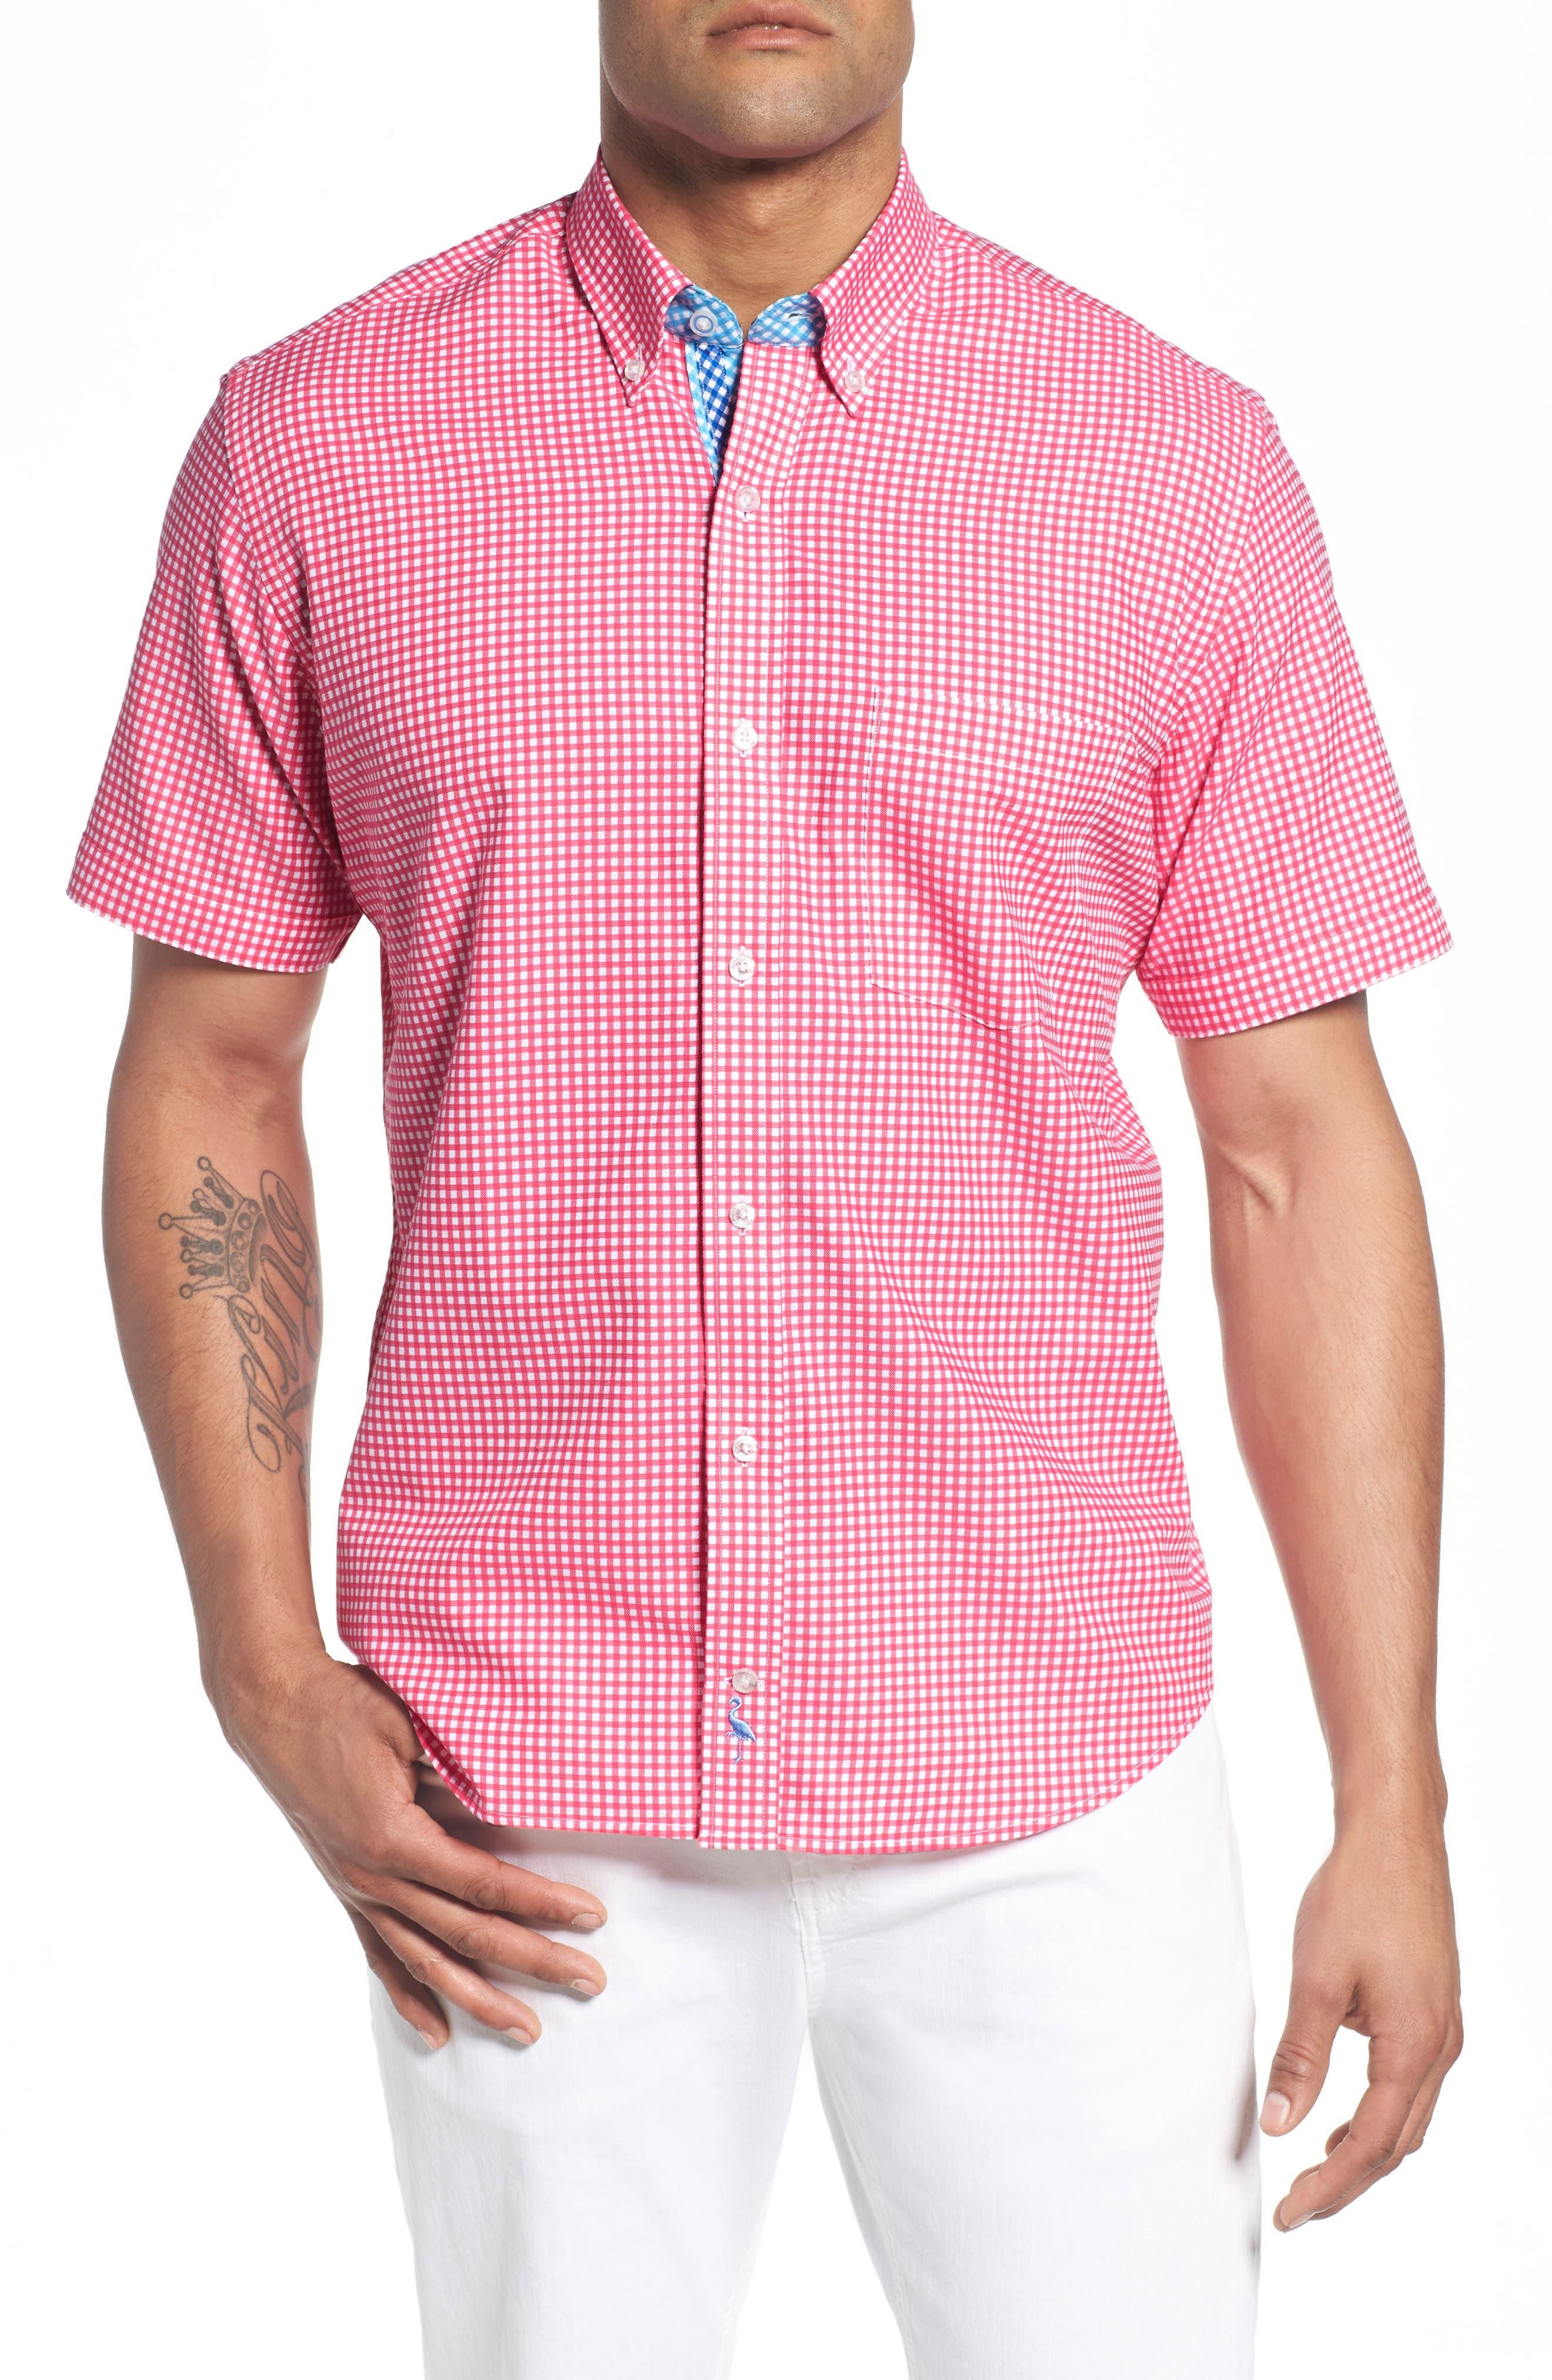 Aden Regular Fit Sport Shirt,                         Main,                         color, Coral